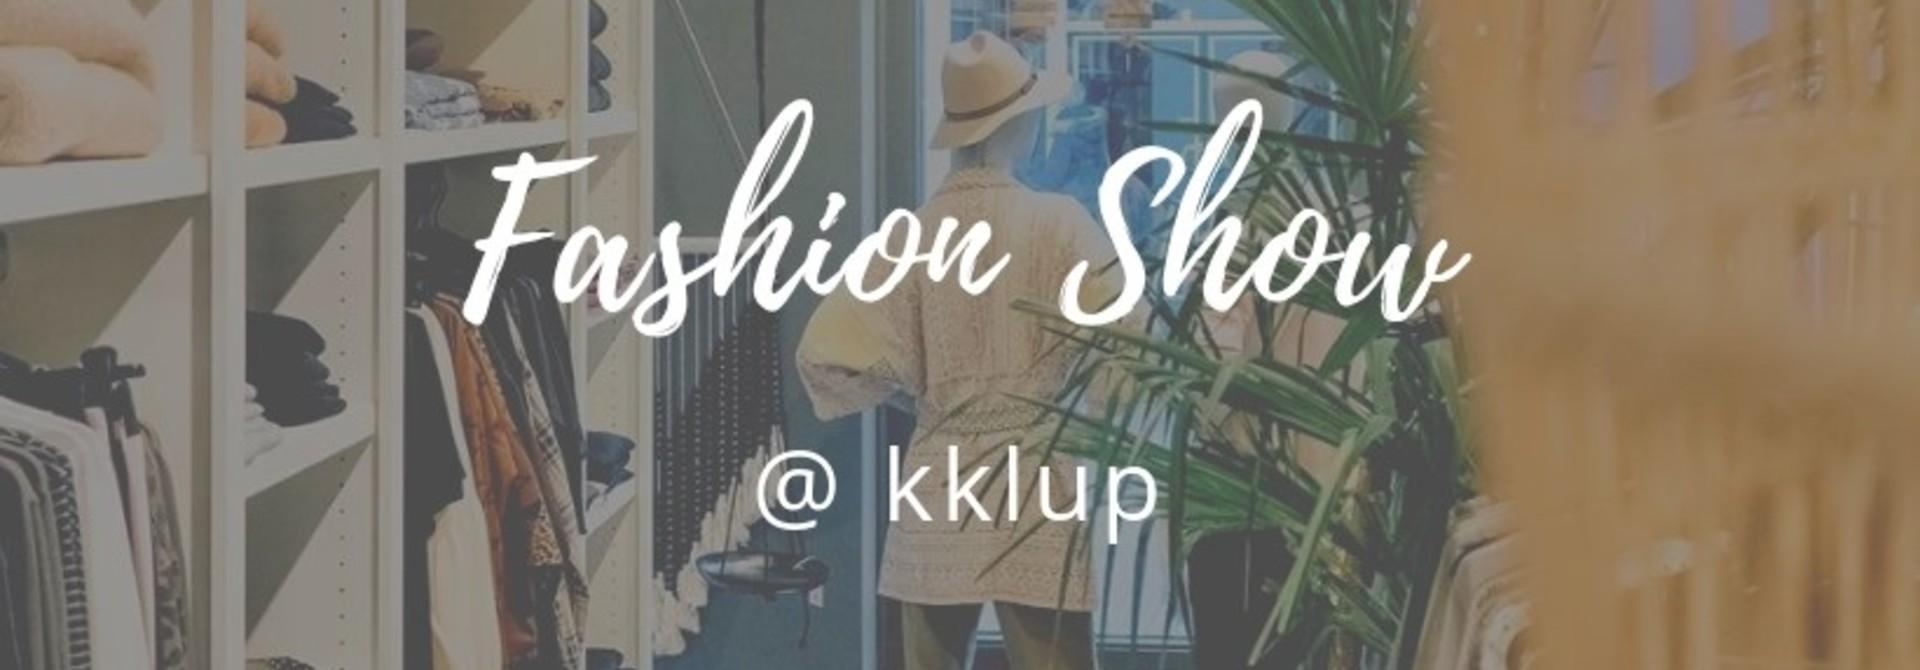 Zondag 25 augustus: kklup fashion show